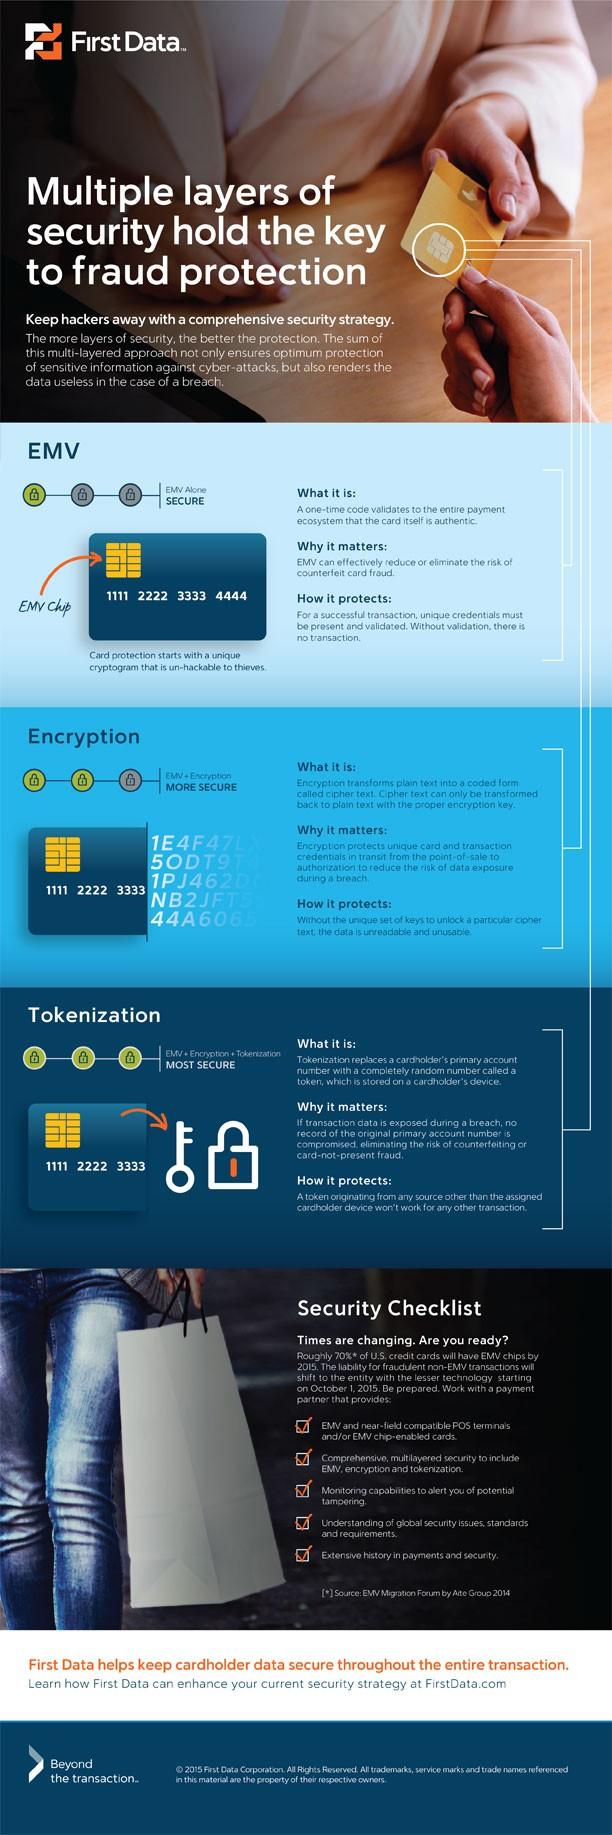 First Data EMV security infogrpahic